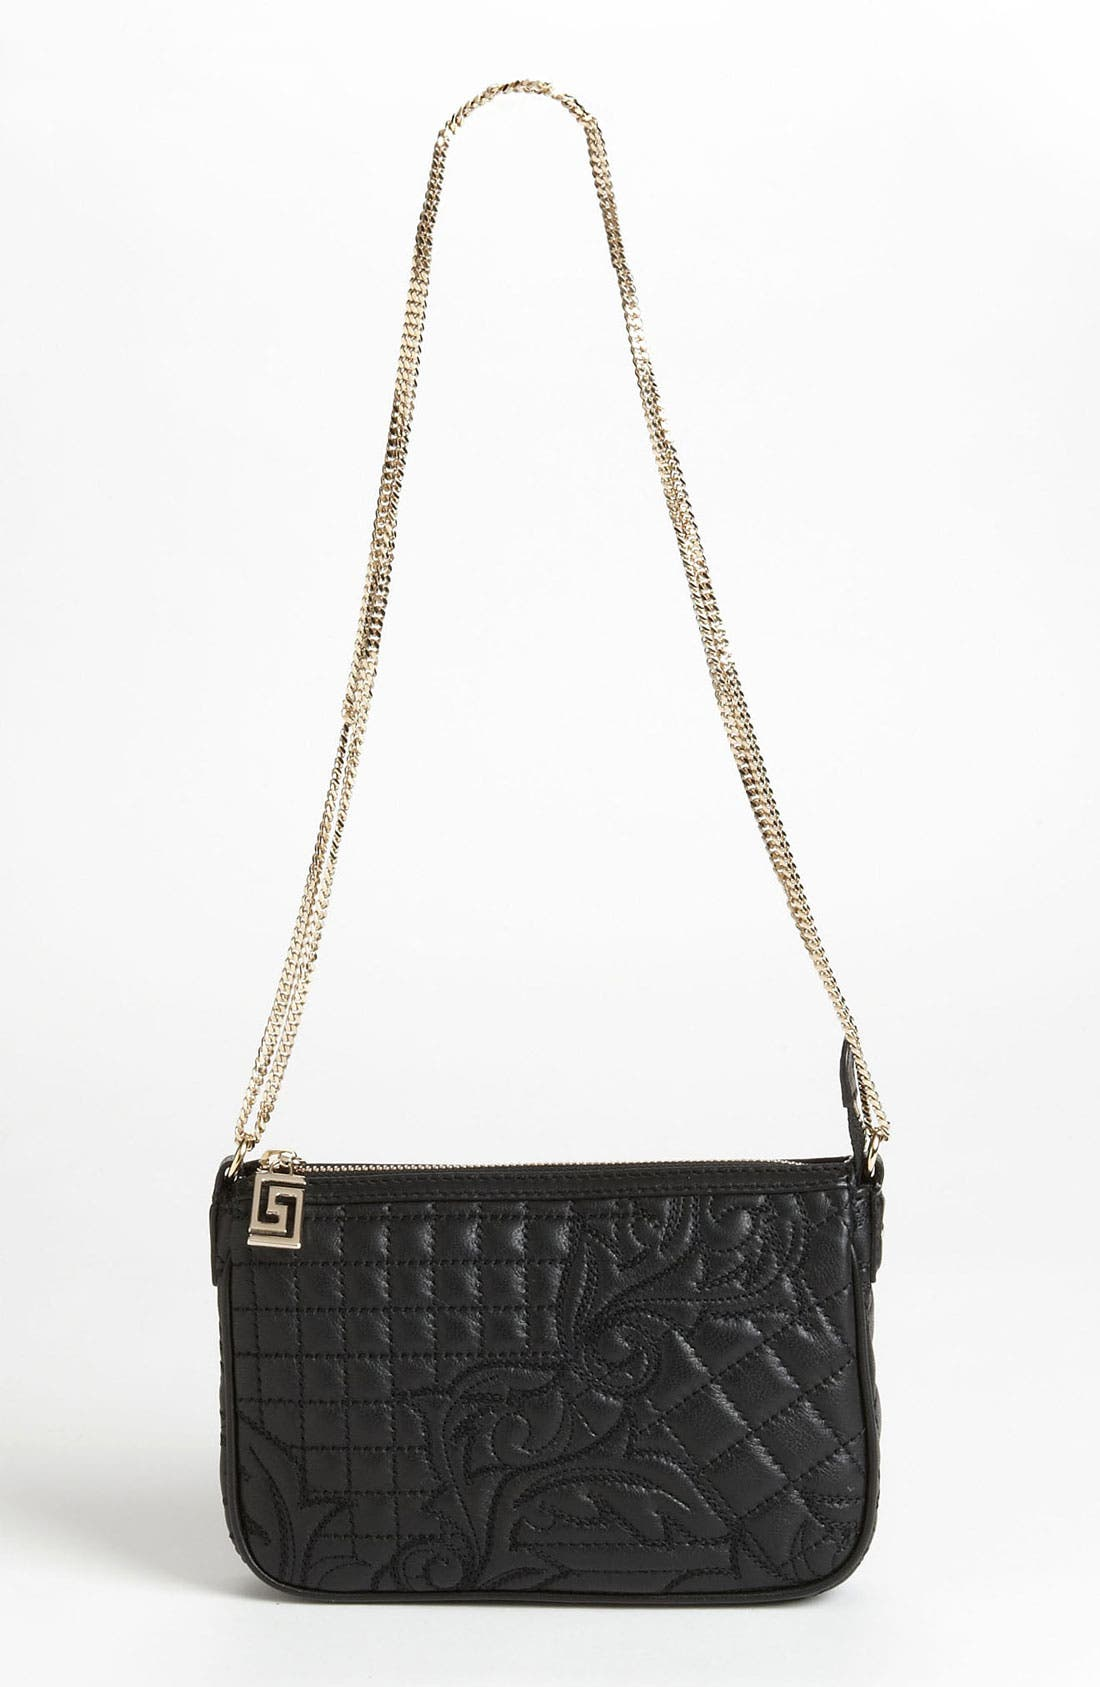 Alternate Image 1 Selected - Versace 'Vanitas' Leather Crossbody Bag